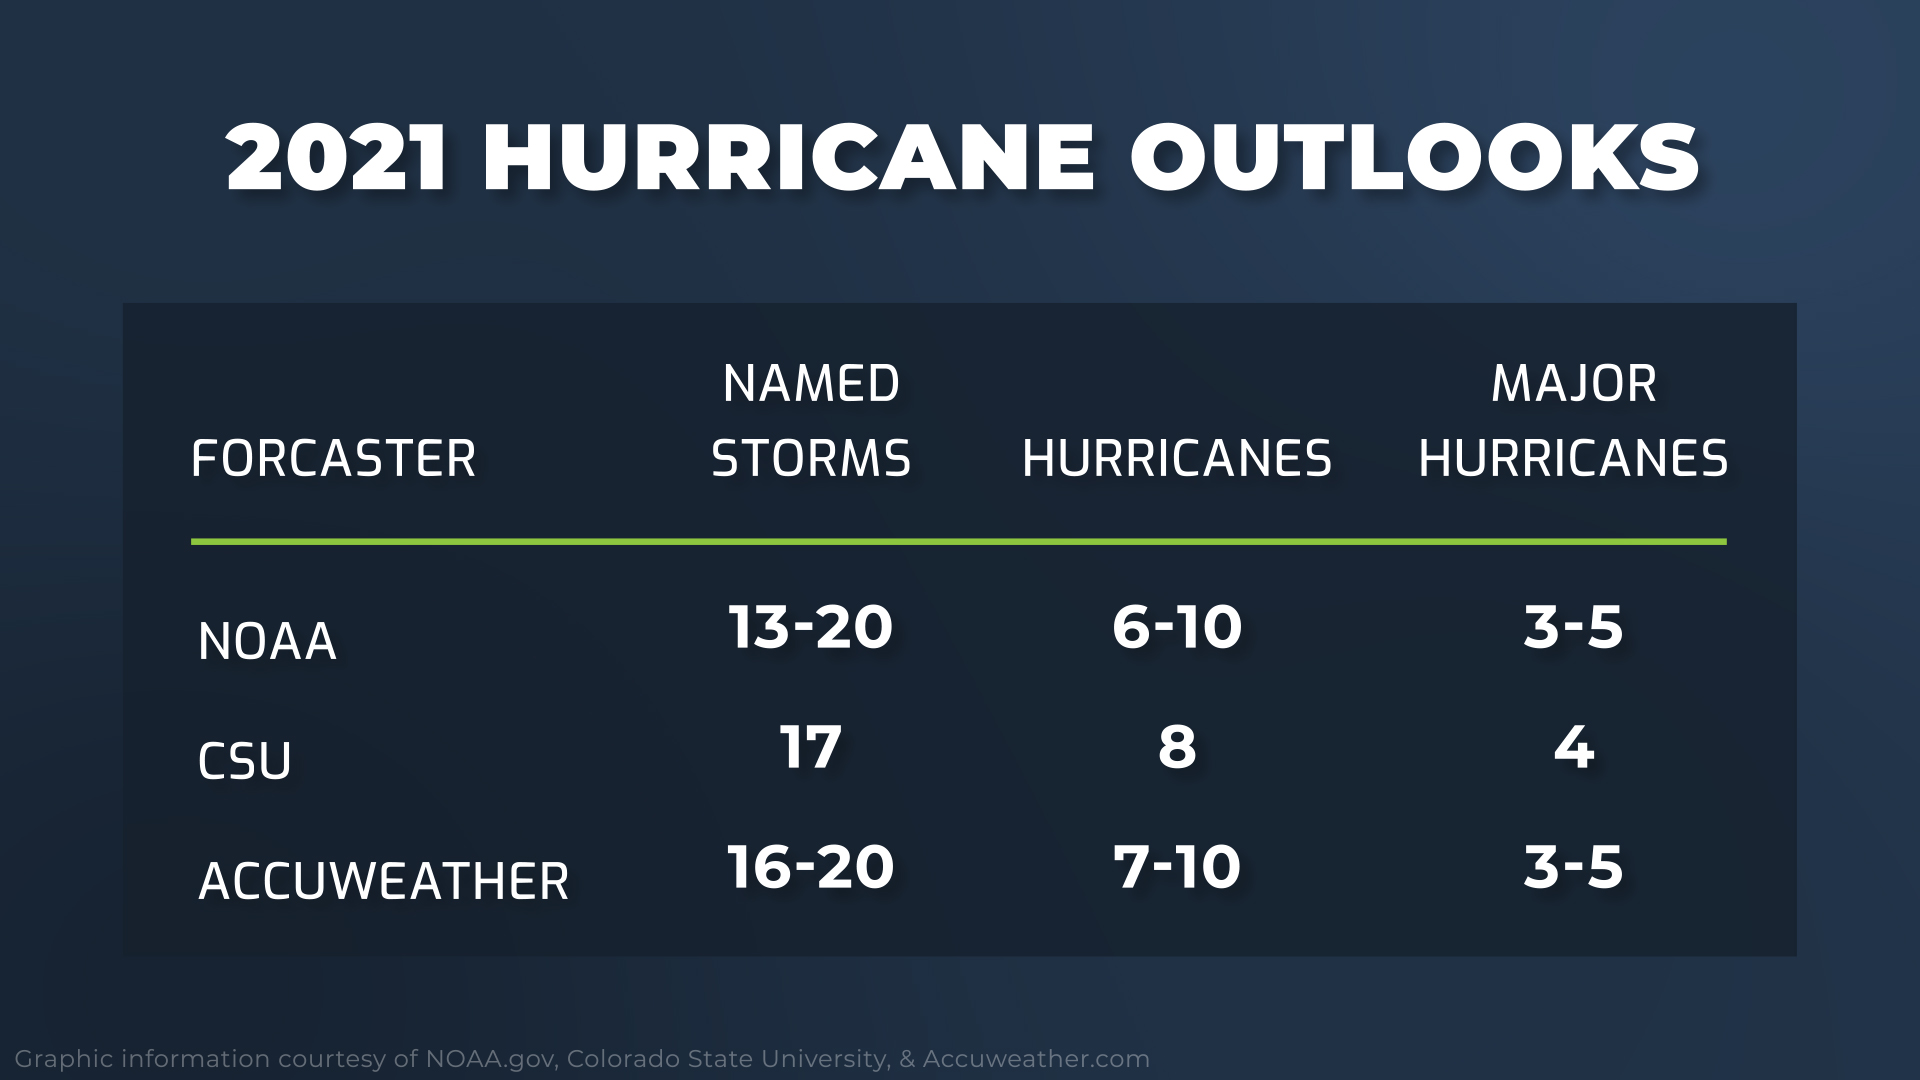 RMC Hurricane Outlook 2021 Summary